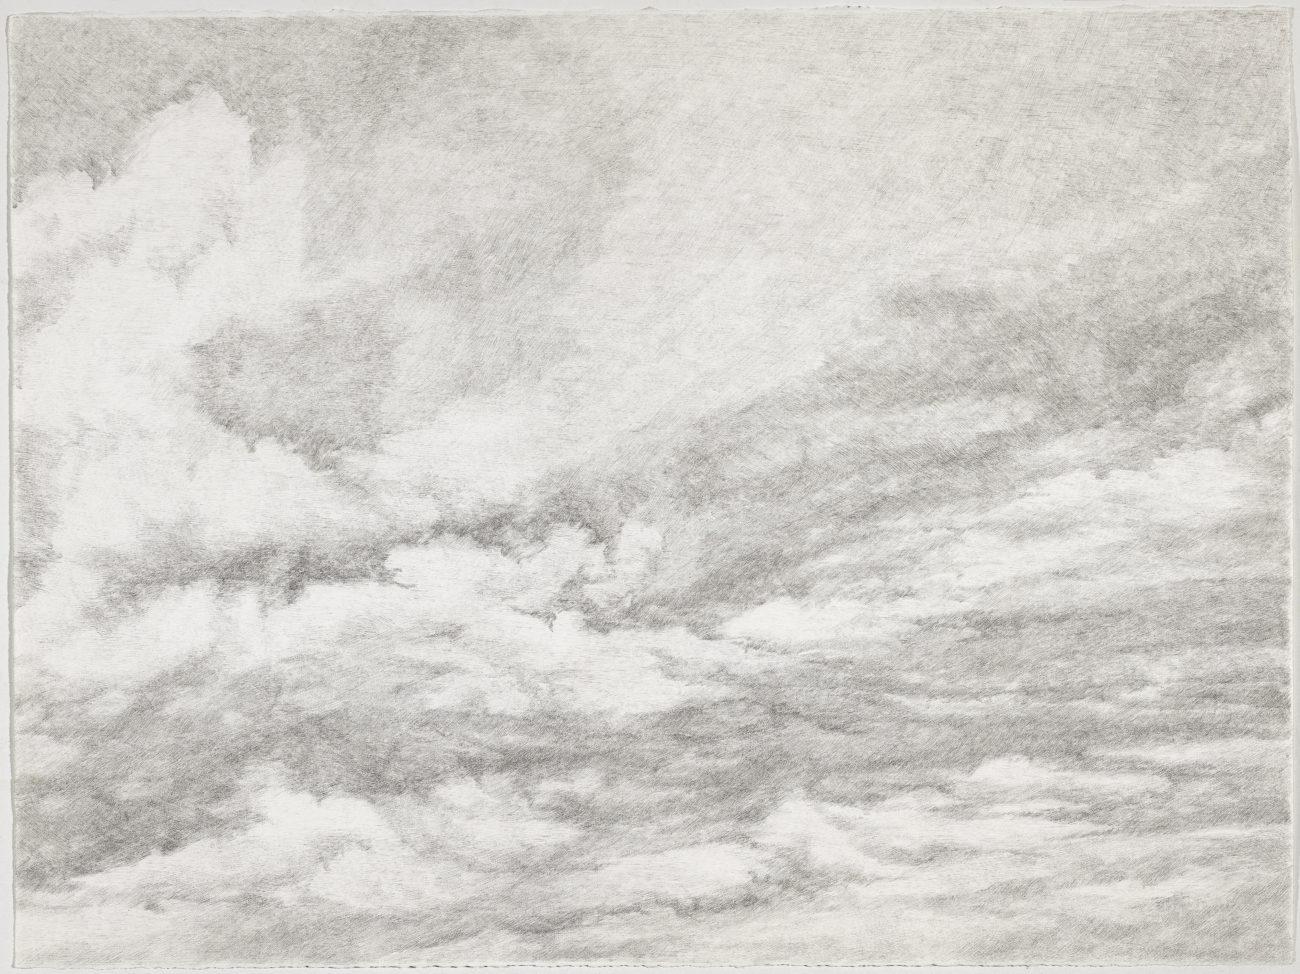 clouds, sunset, industry, landscapes, french, art, henninger